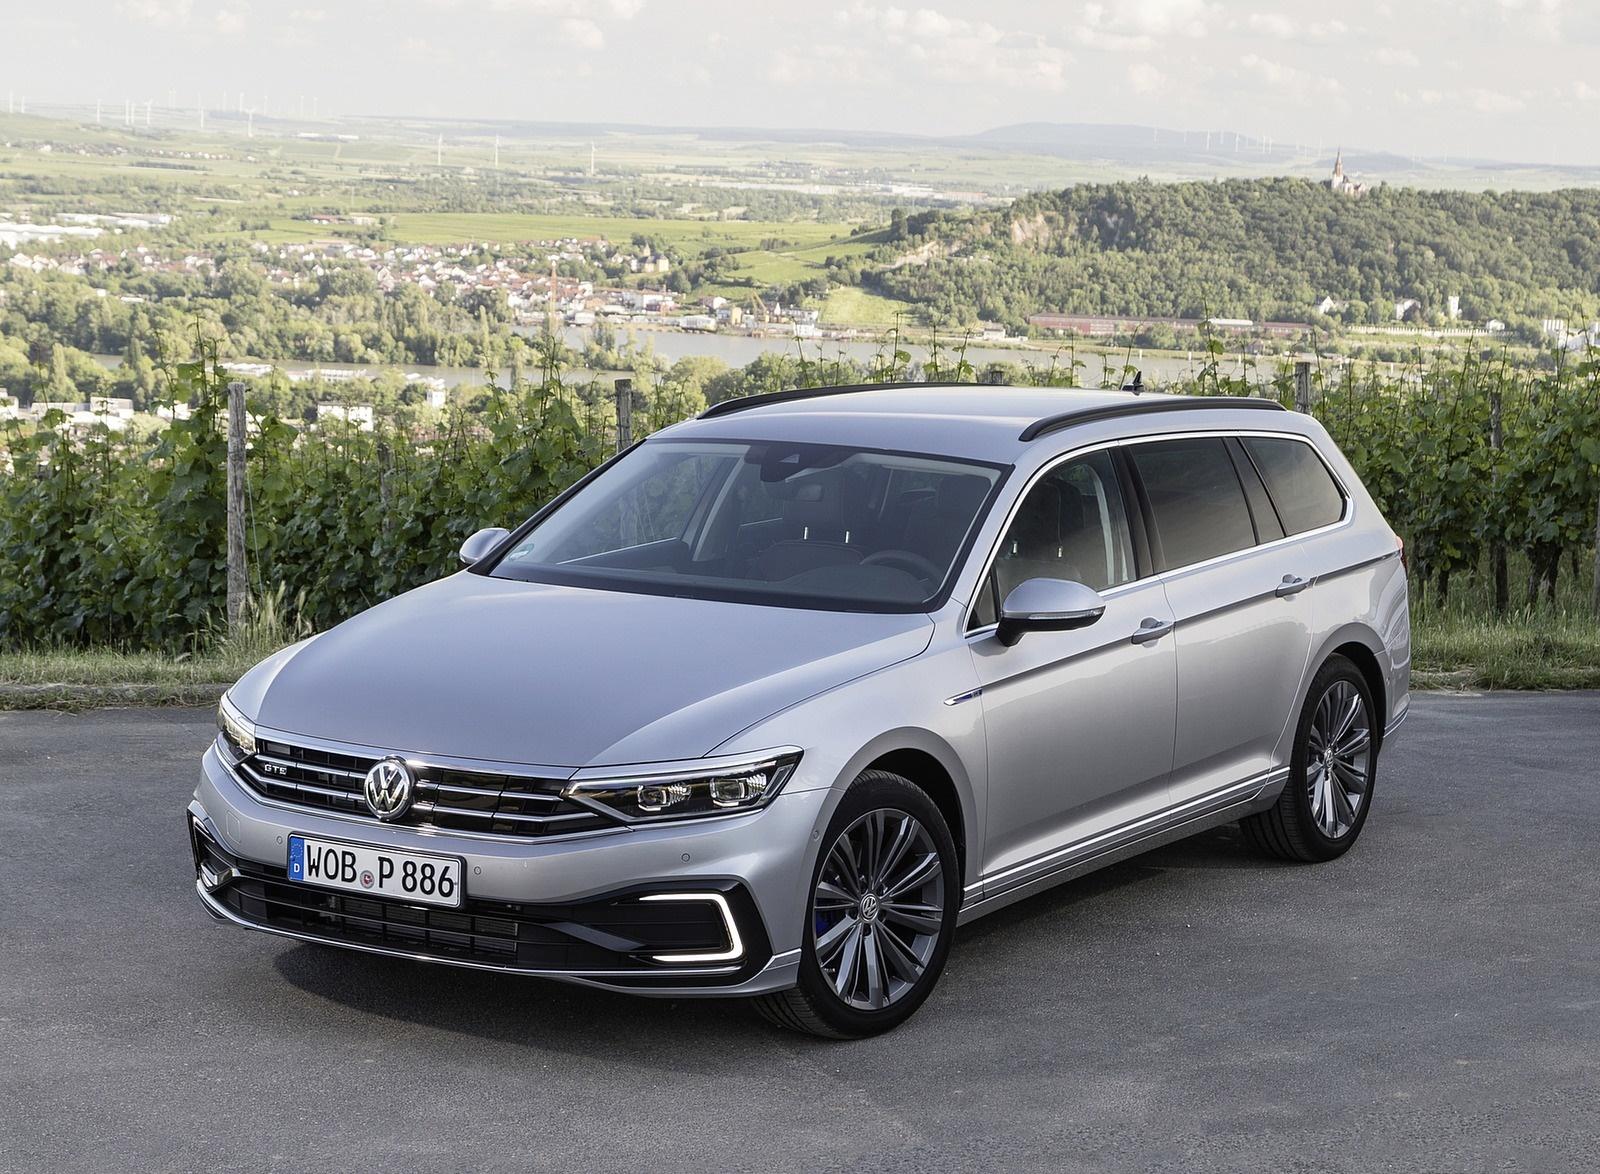 2020 Volkswagen Passat GTE Variant (Plug-In Hybrid EU-Spec) Front Three-Quarter Wallpapers (11)